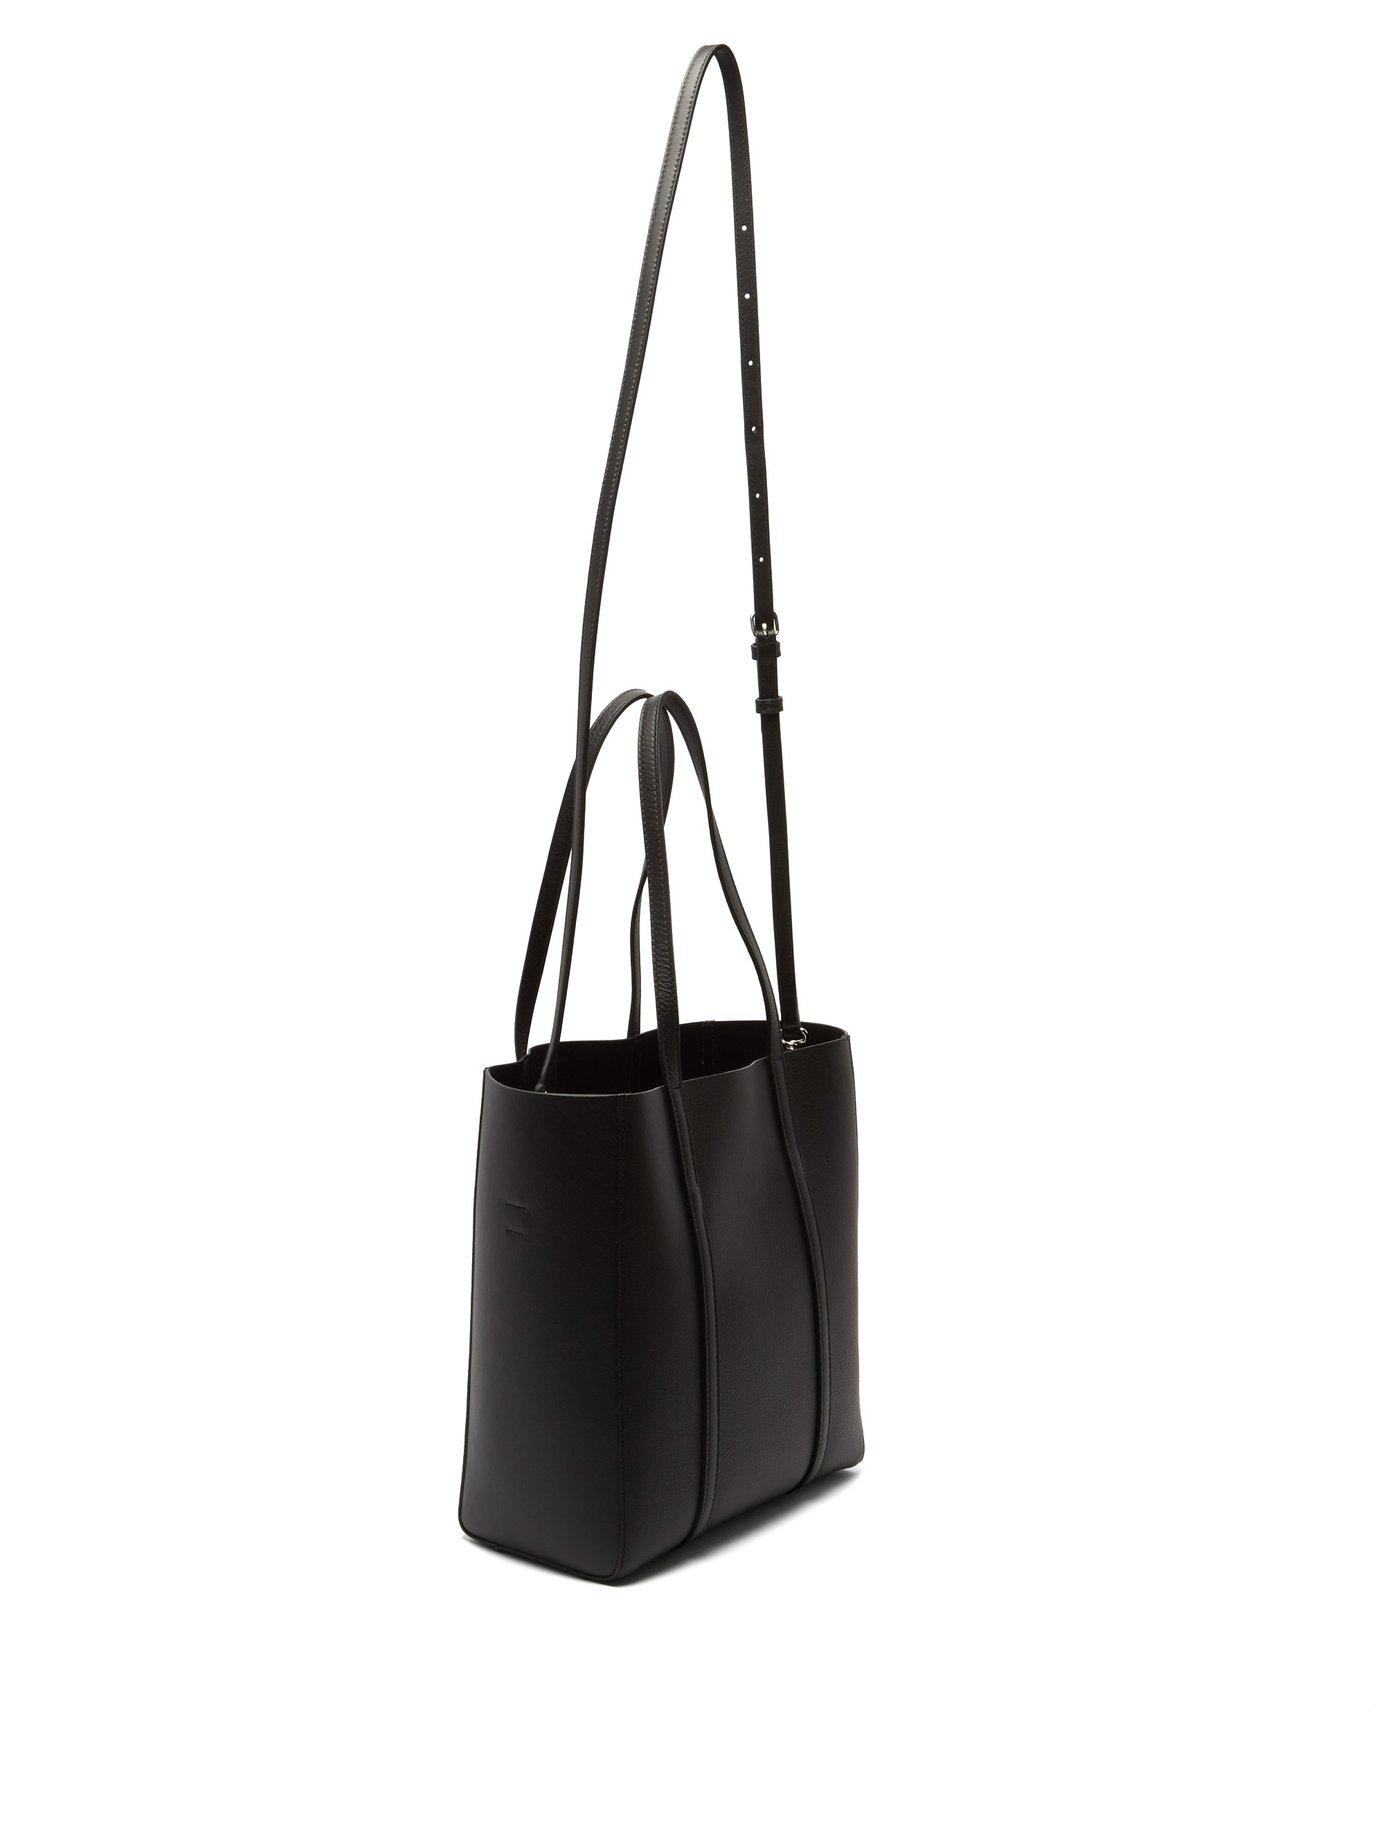 Lyst - Balenciaga Everyday Tote Xs in Black